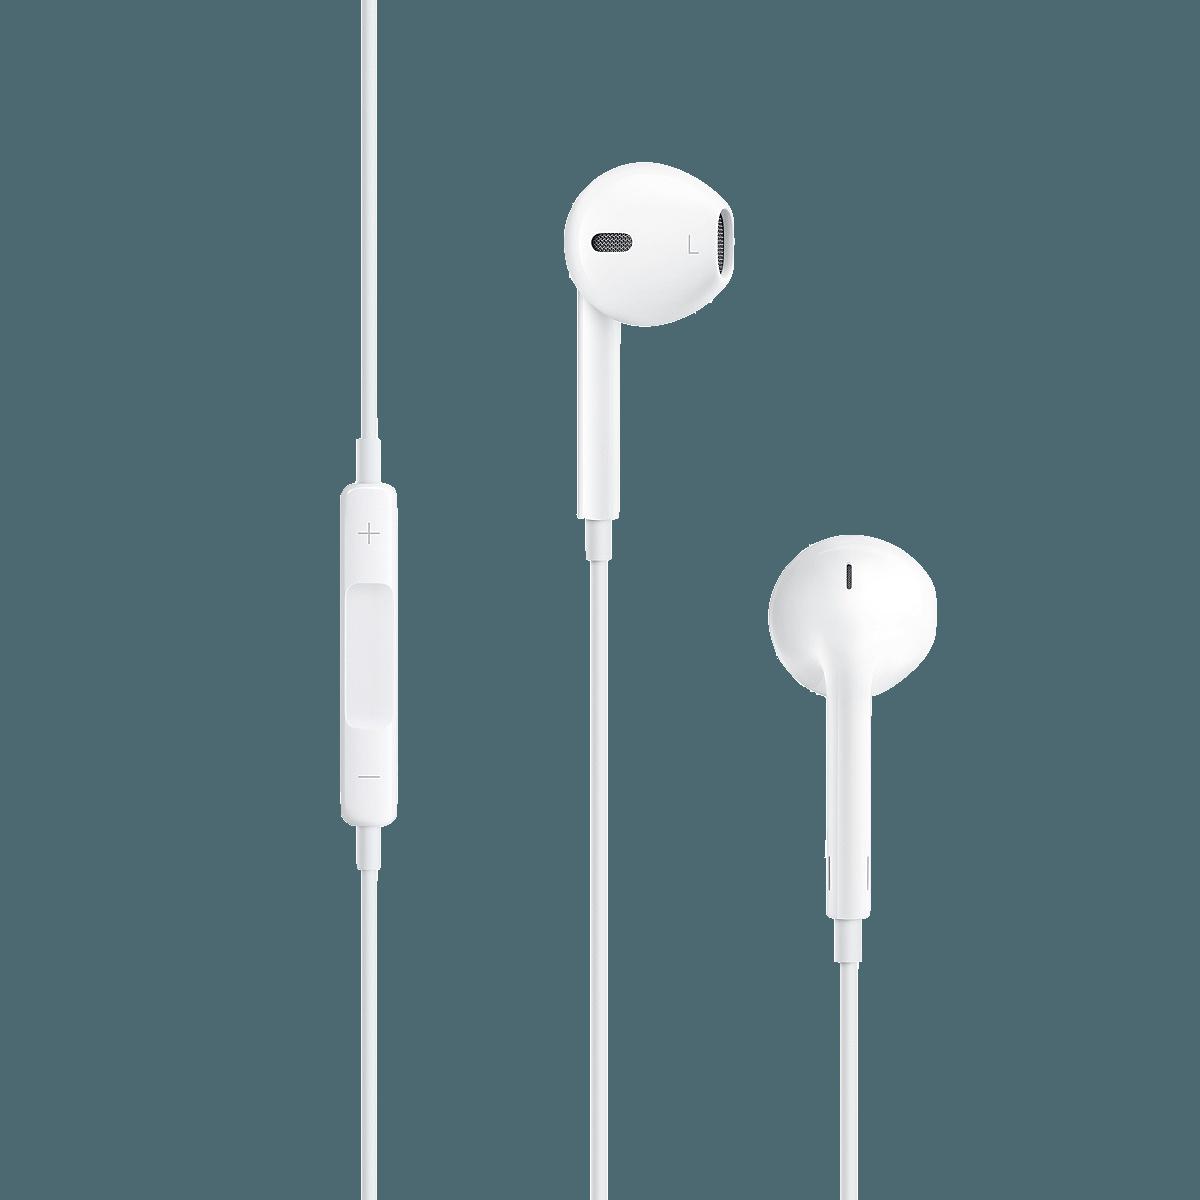 Headphones clipart earpods. Accessories apple mm plug